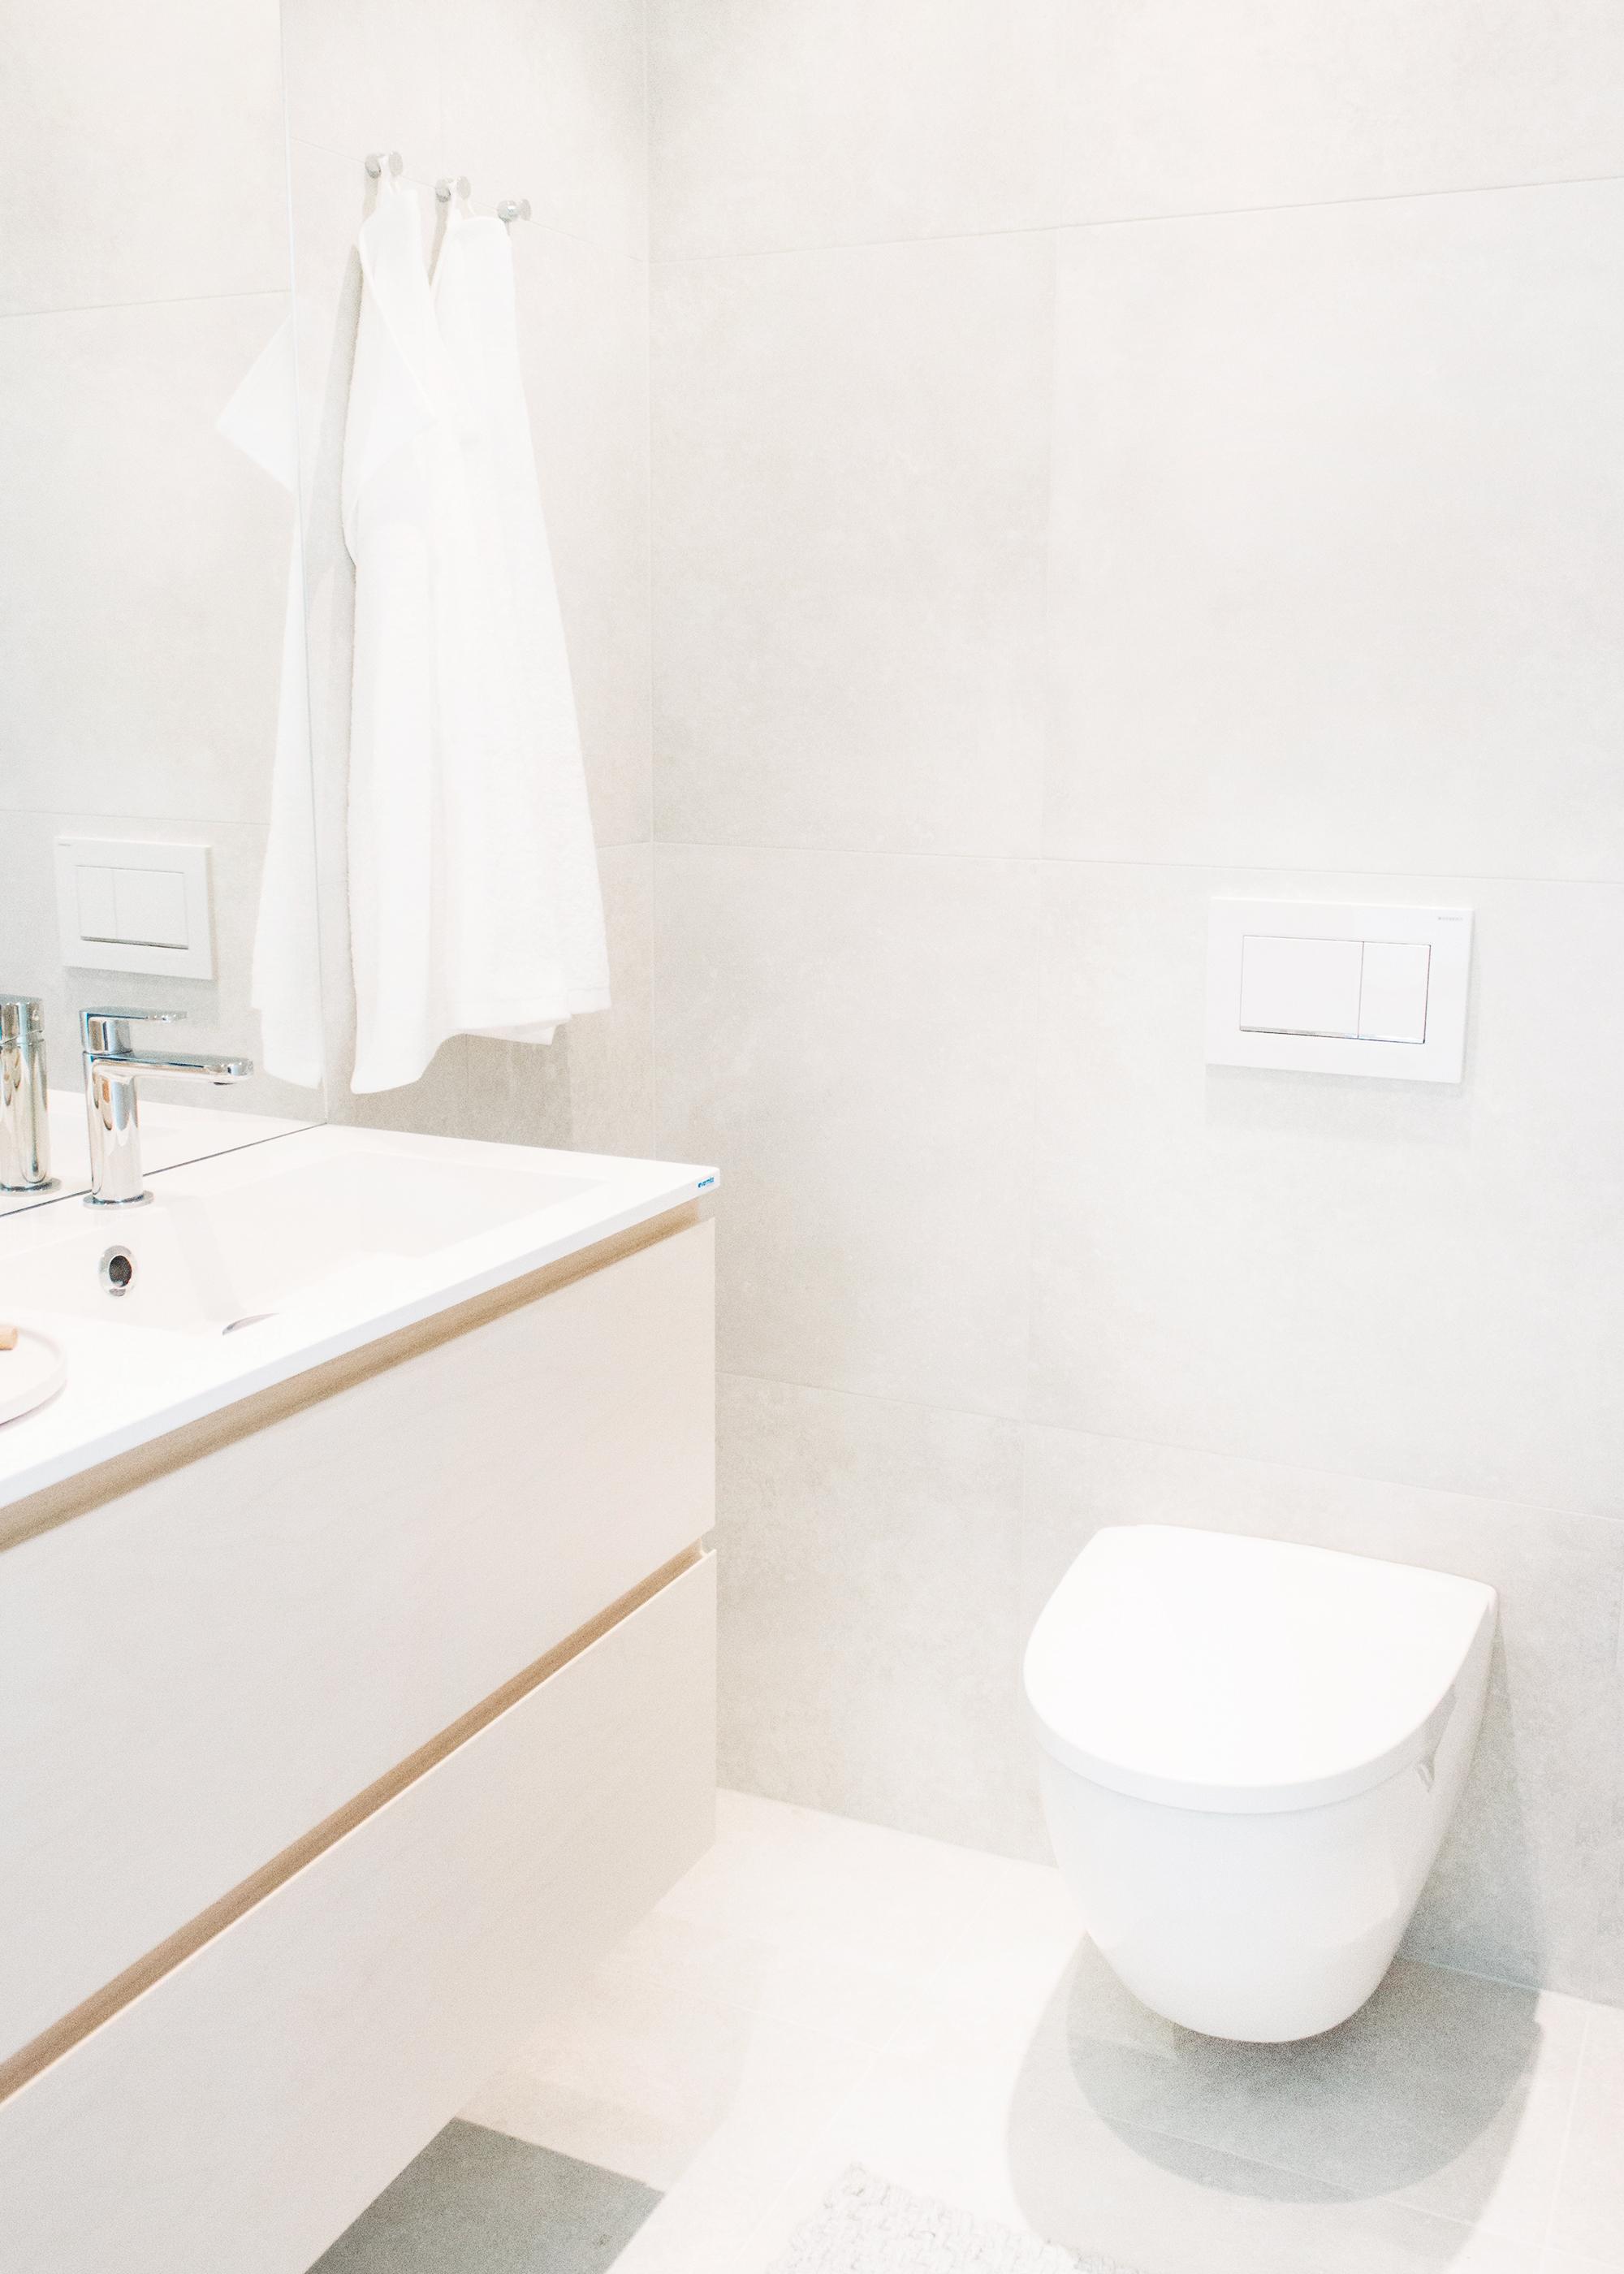 Home Tour: Our Small Guest Bathroom | Vårt gästbadrum | Scandinavian interior design | Minimalist style | By Sandramaria | Sandramarias.com